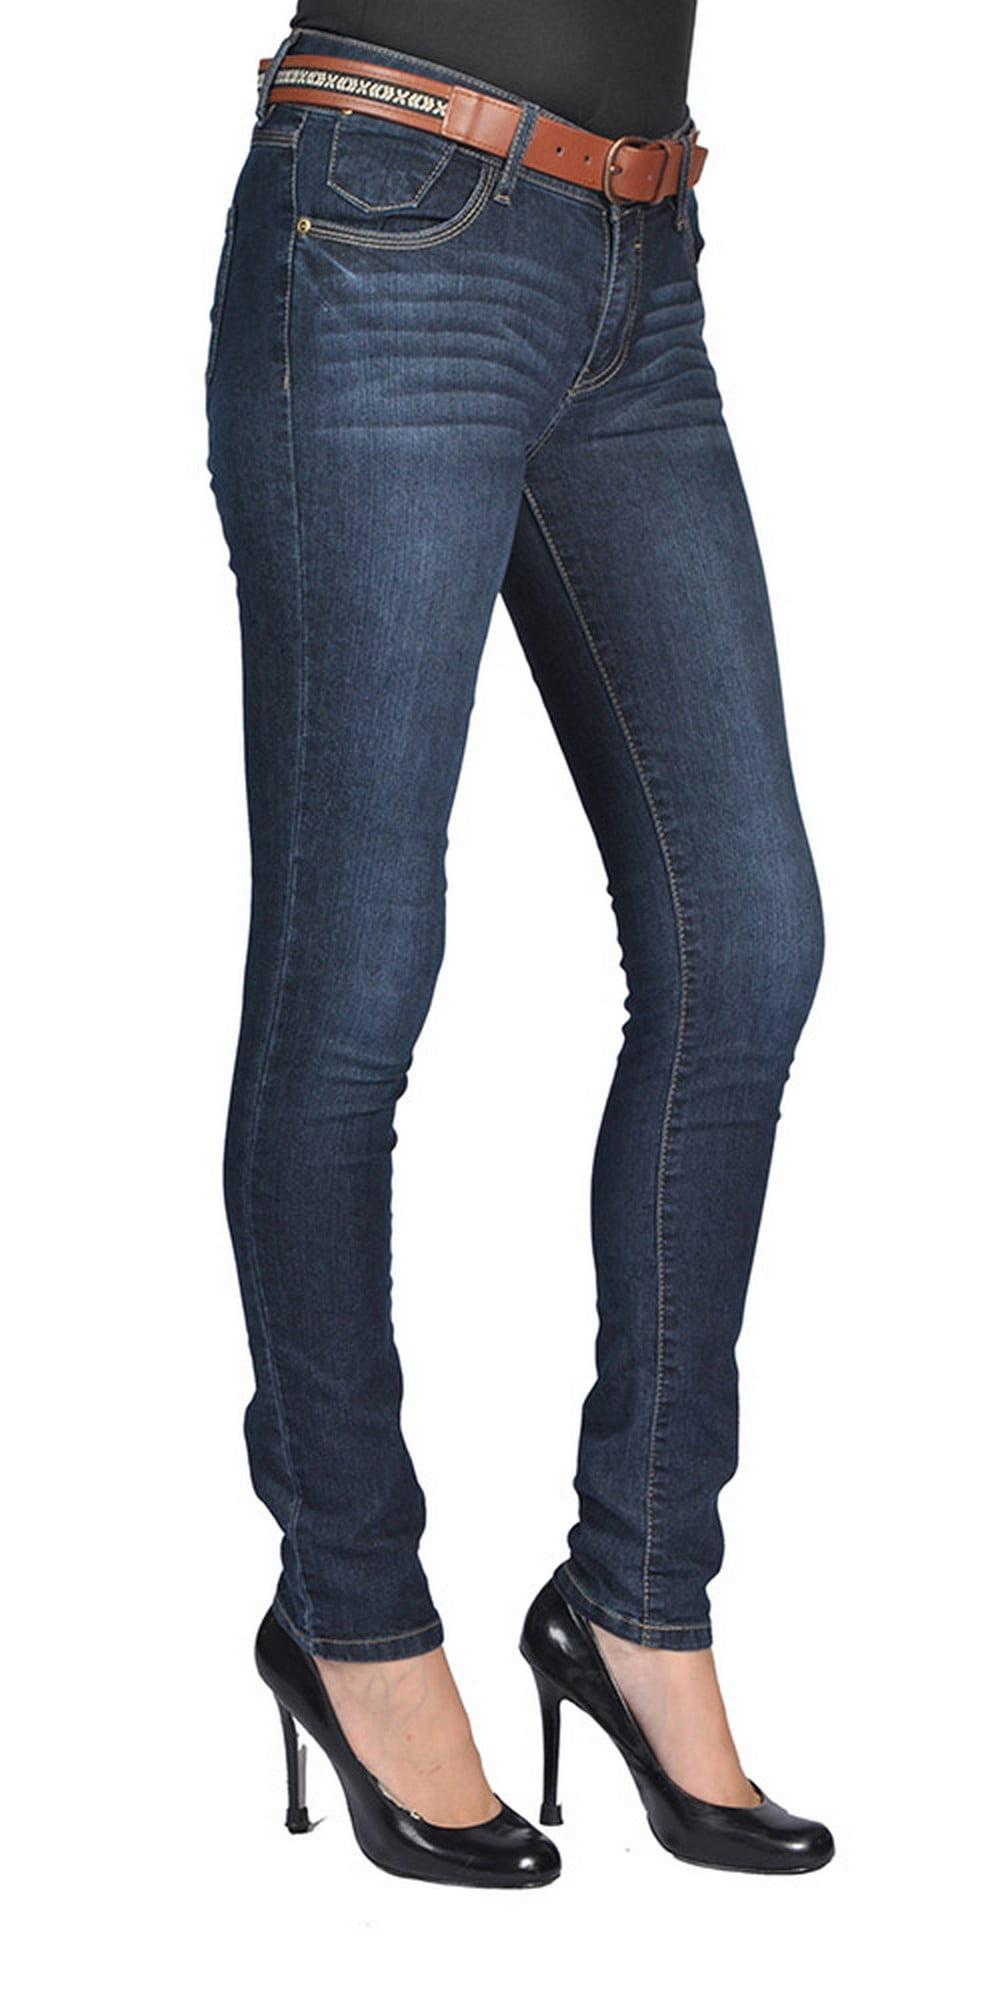 Stretch Denim Womens Belted Skinny High Fashion Jeans Dark Wash